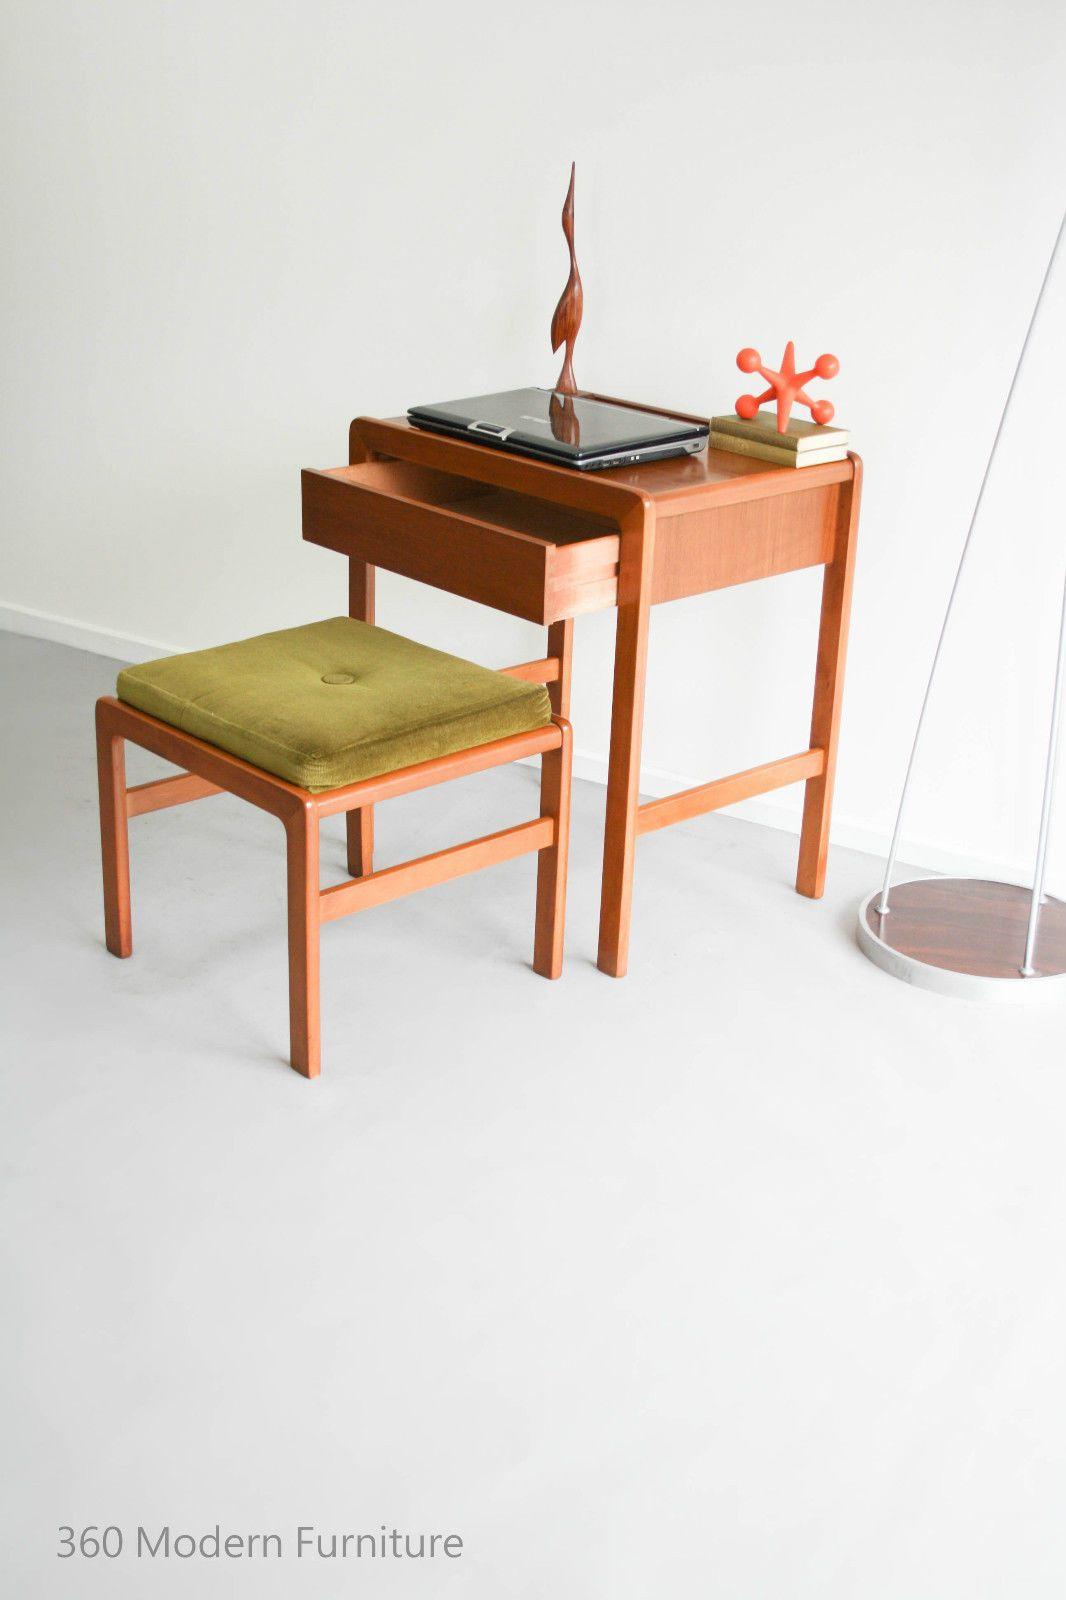 Mid century modern kalmar desk hall table drawer console stool vintage retro scandi in home garden furniture desks home office furniture ebay 360